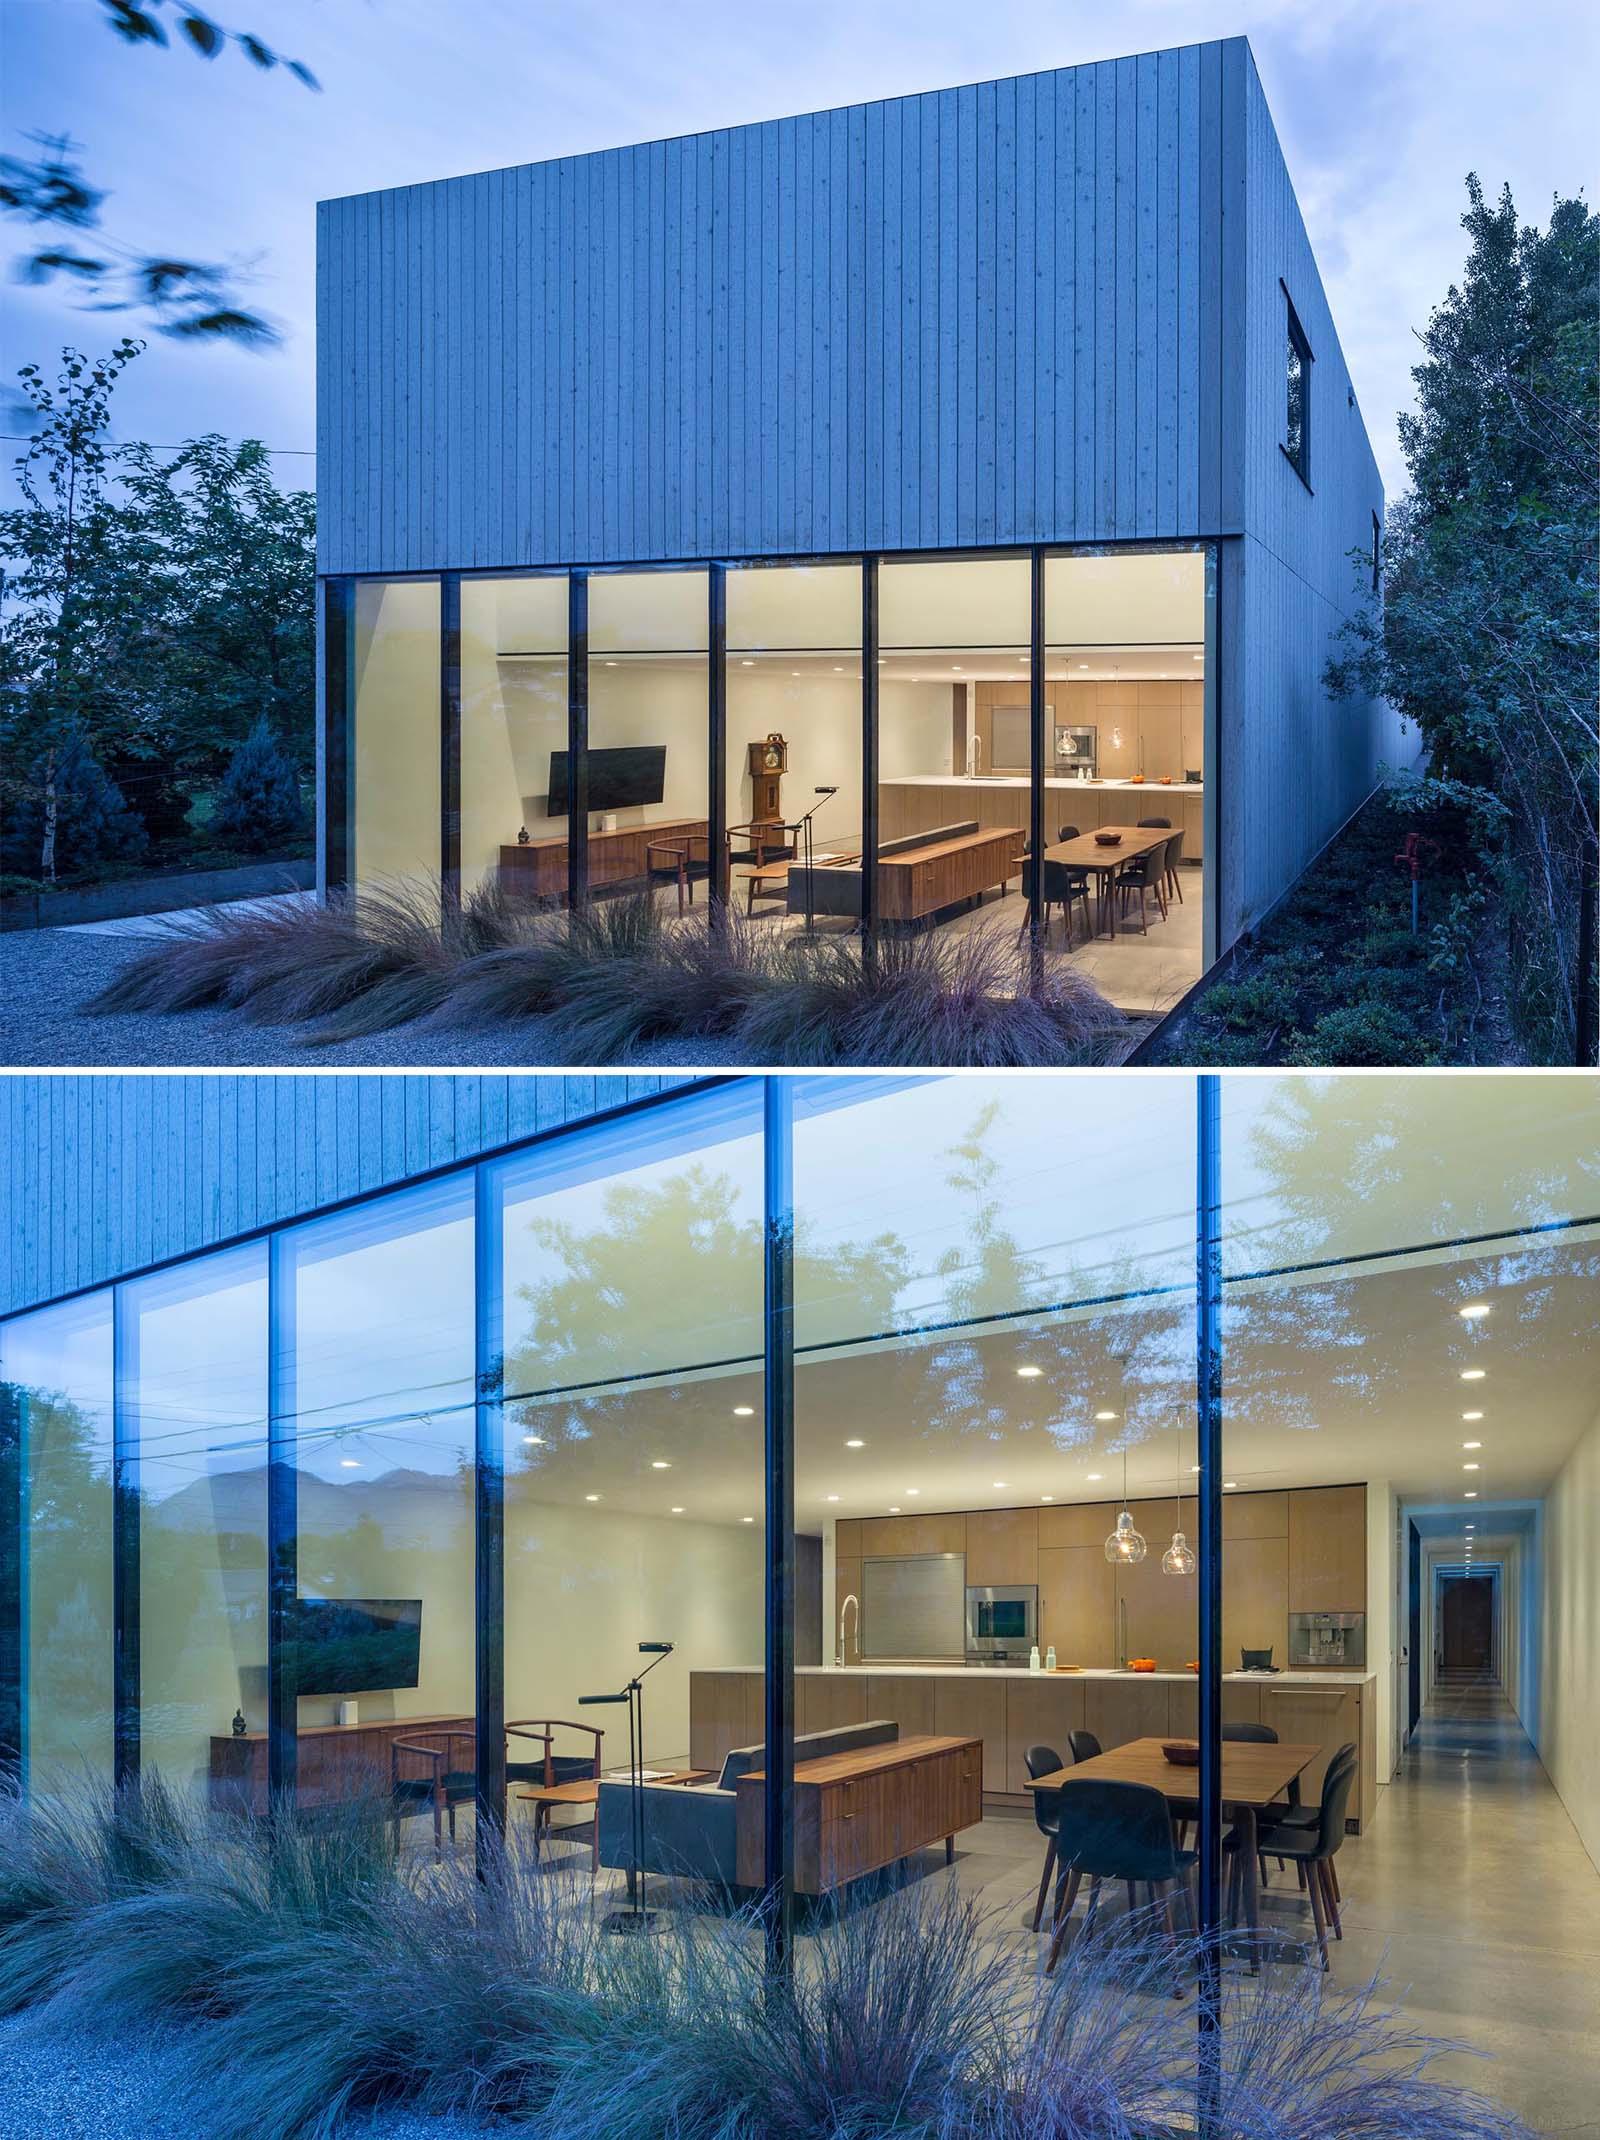 A modern cedar clad home with a glass wall.